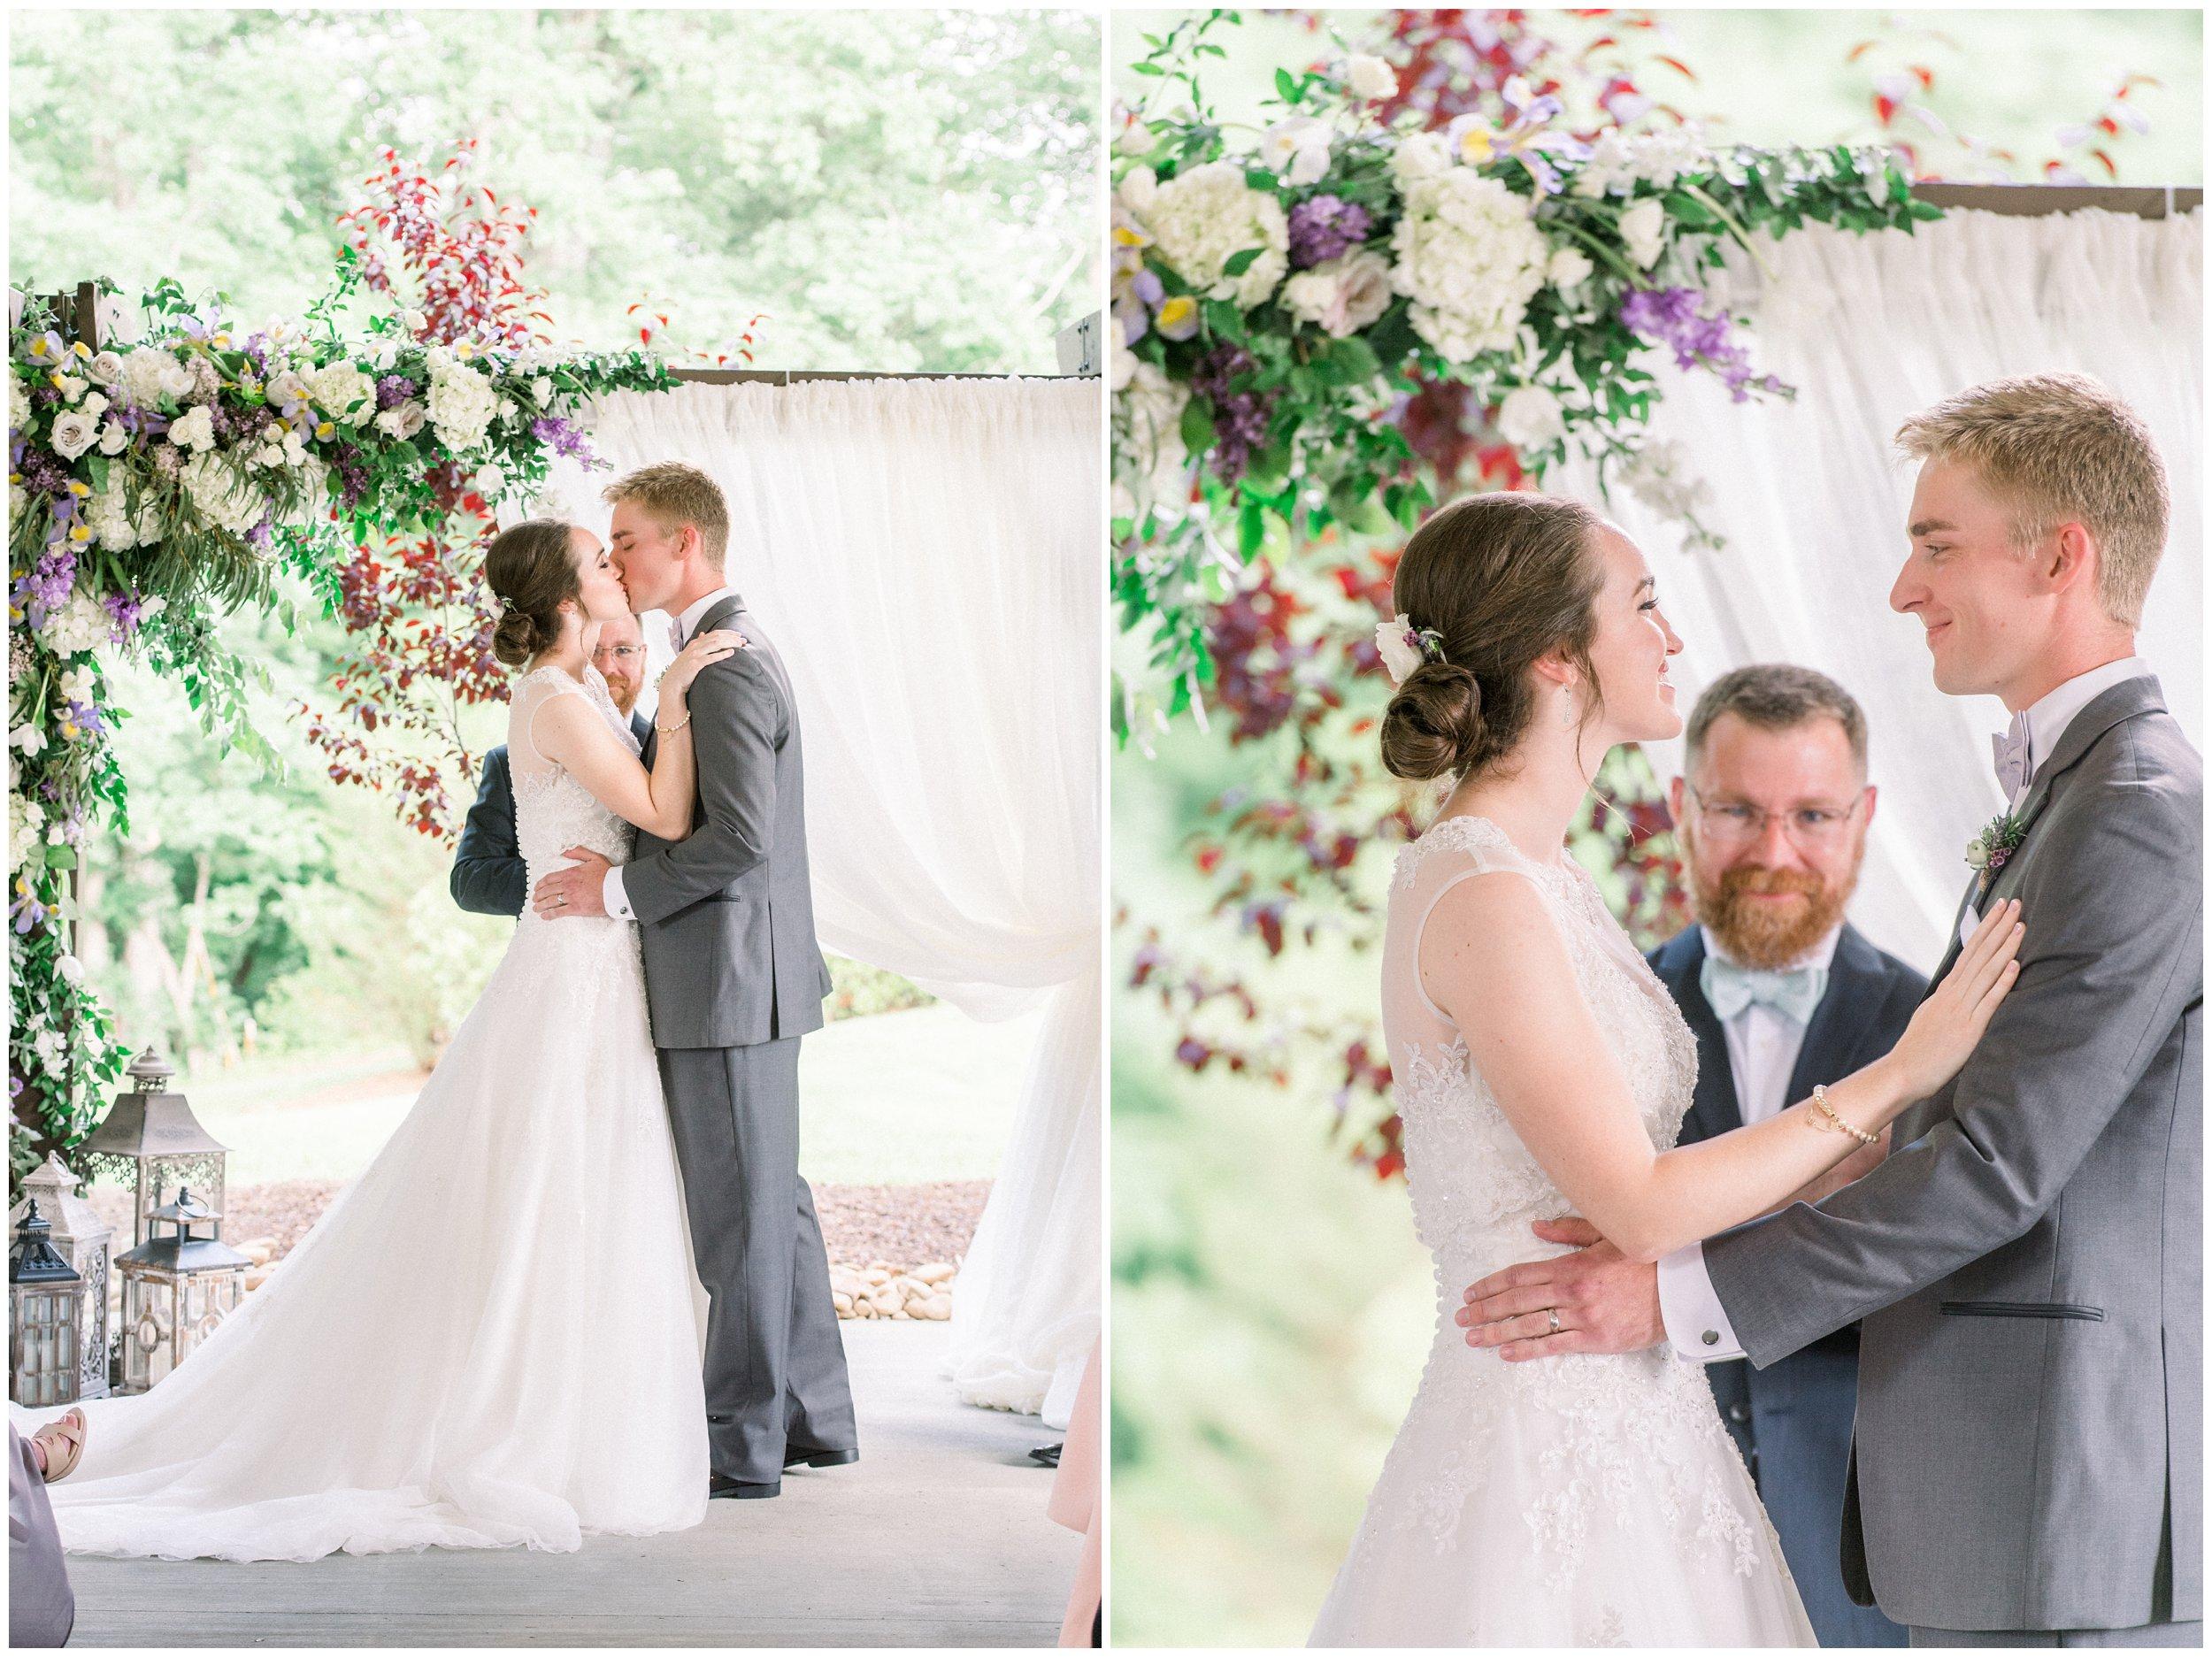 frist kiss as husband and wife south carolina wedding